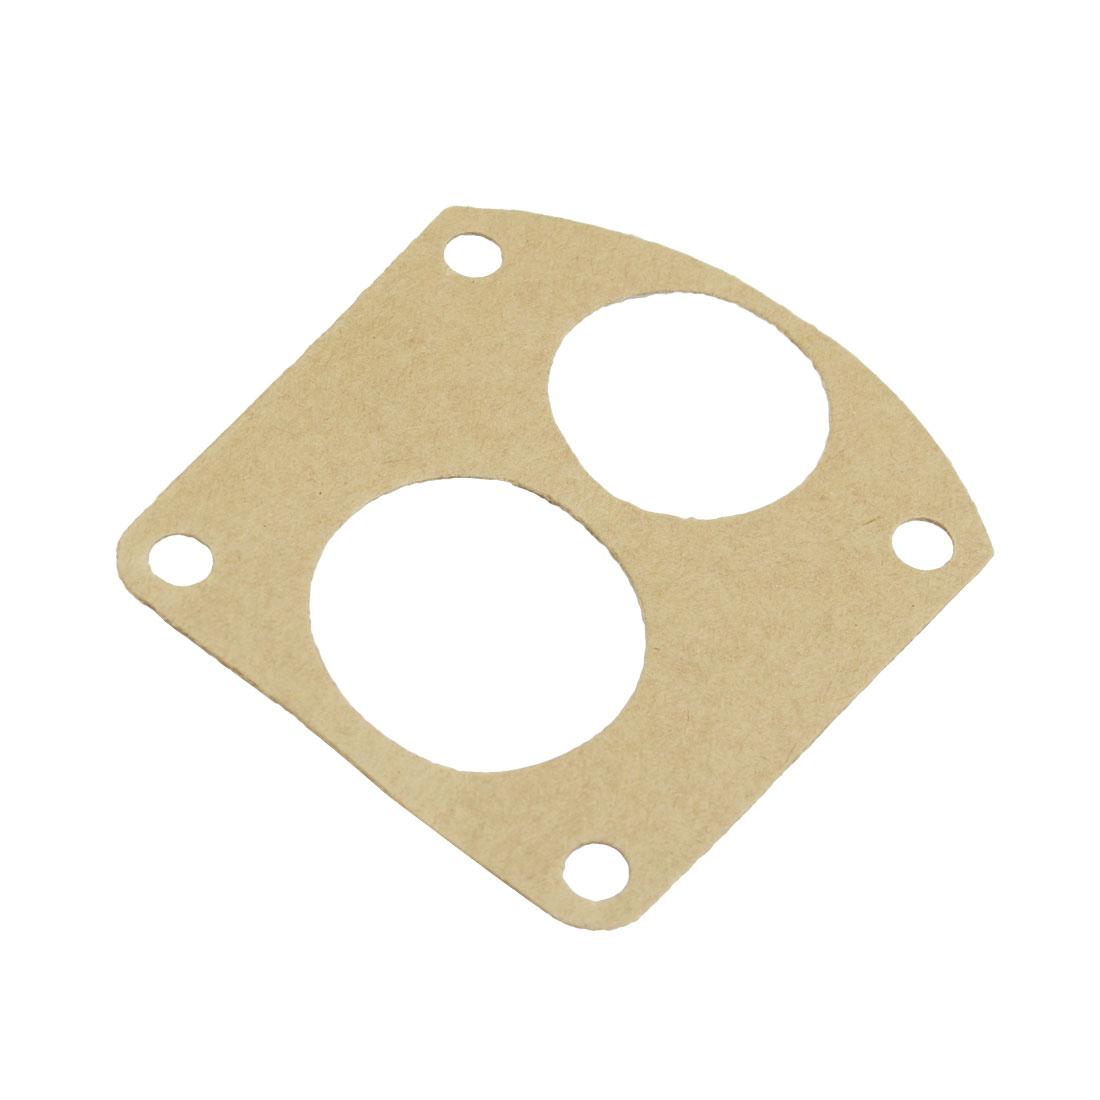 Beige Square Paper Washer for Hitachi E38 Electric Hammer